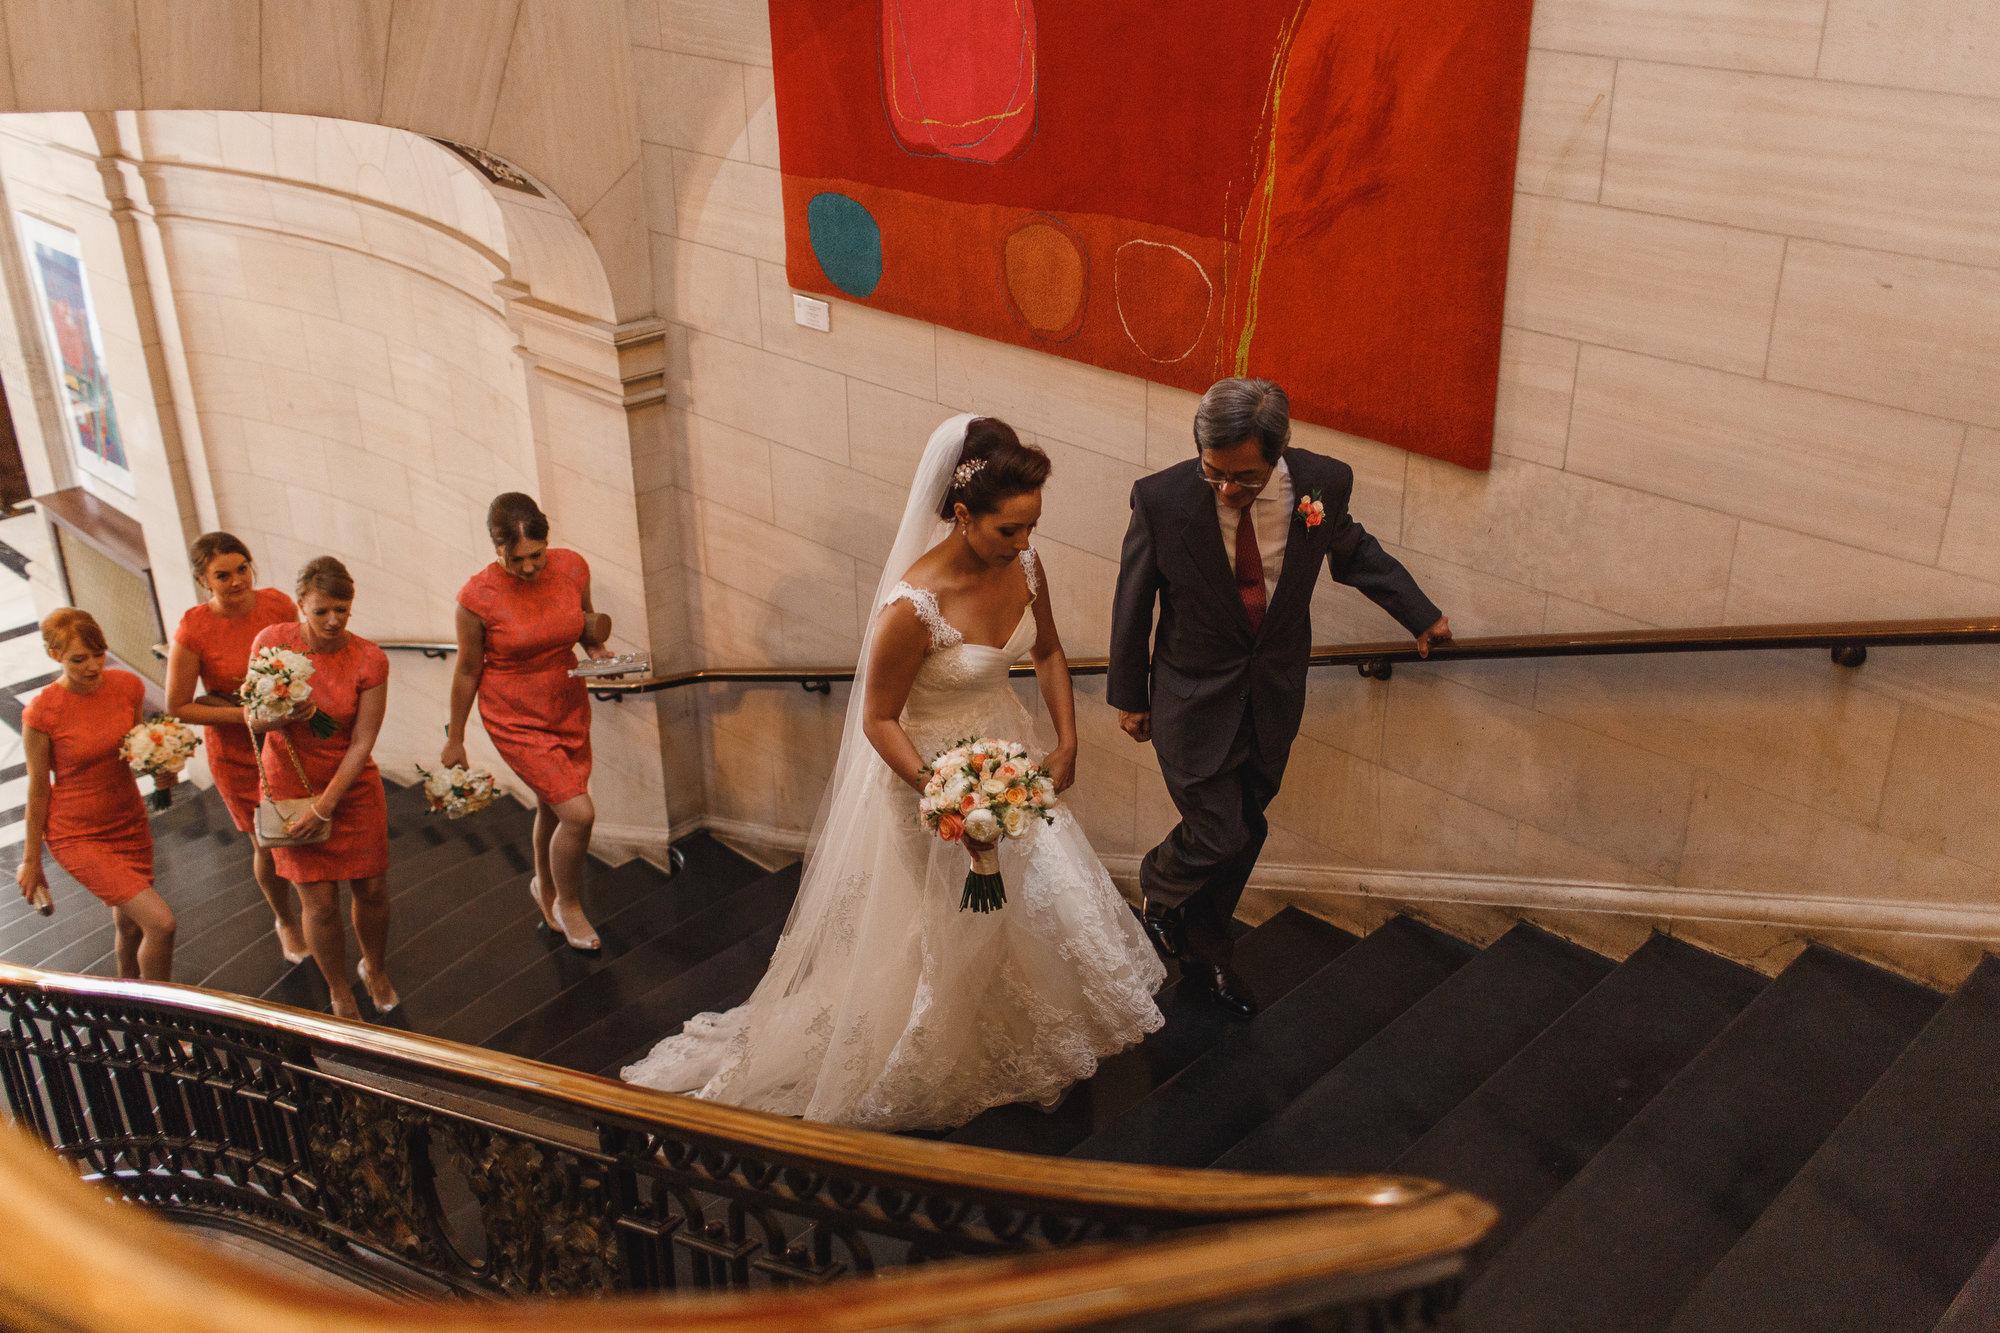 Carlton house terrace wedding photography london arj for 17 carlton house terrace london